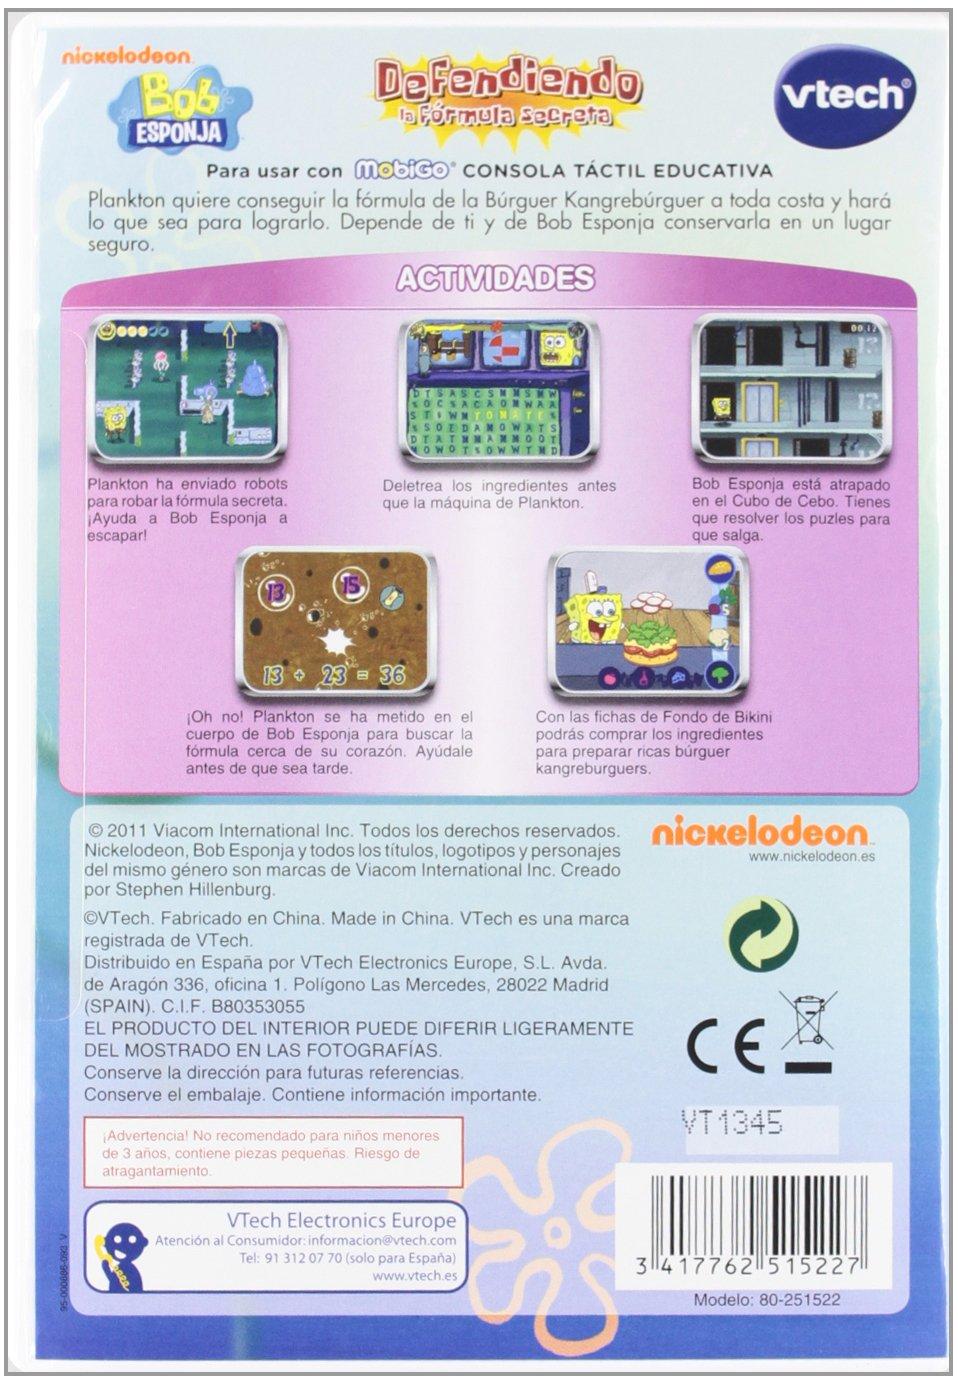 Amazon.com: Vtech Spanish - Vtech Juego MobiGo Spongebob - En Español: Toys & Games